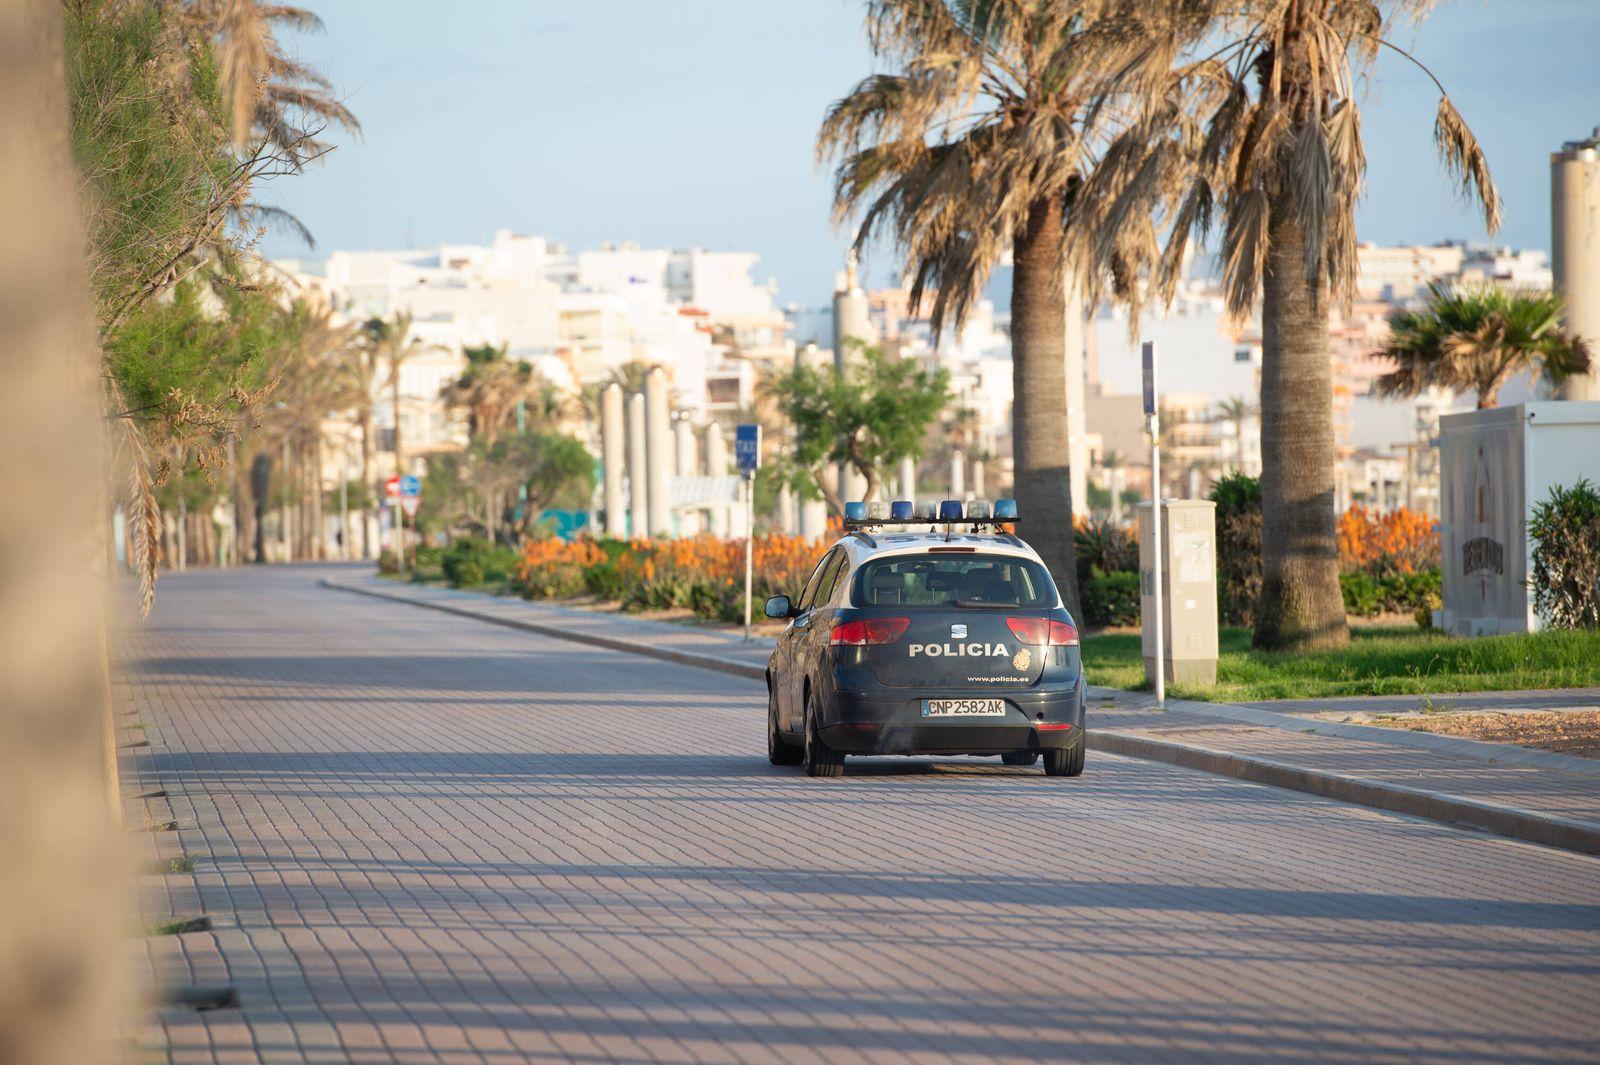 20200423 Corona Lock down in Mallorca PALMA DE MALLORCA, SPAIN - APRIL 23 2020 : Car of the Policia National ant the Pl